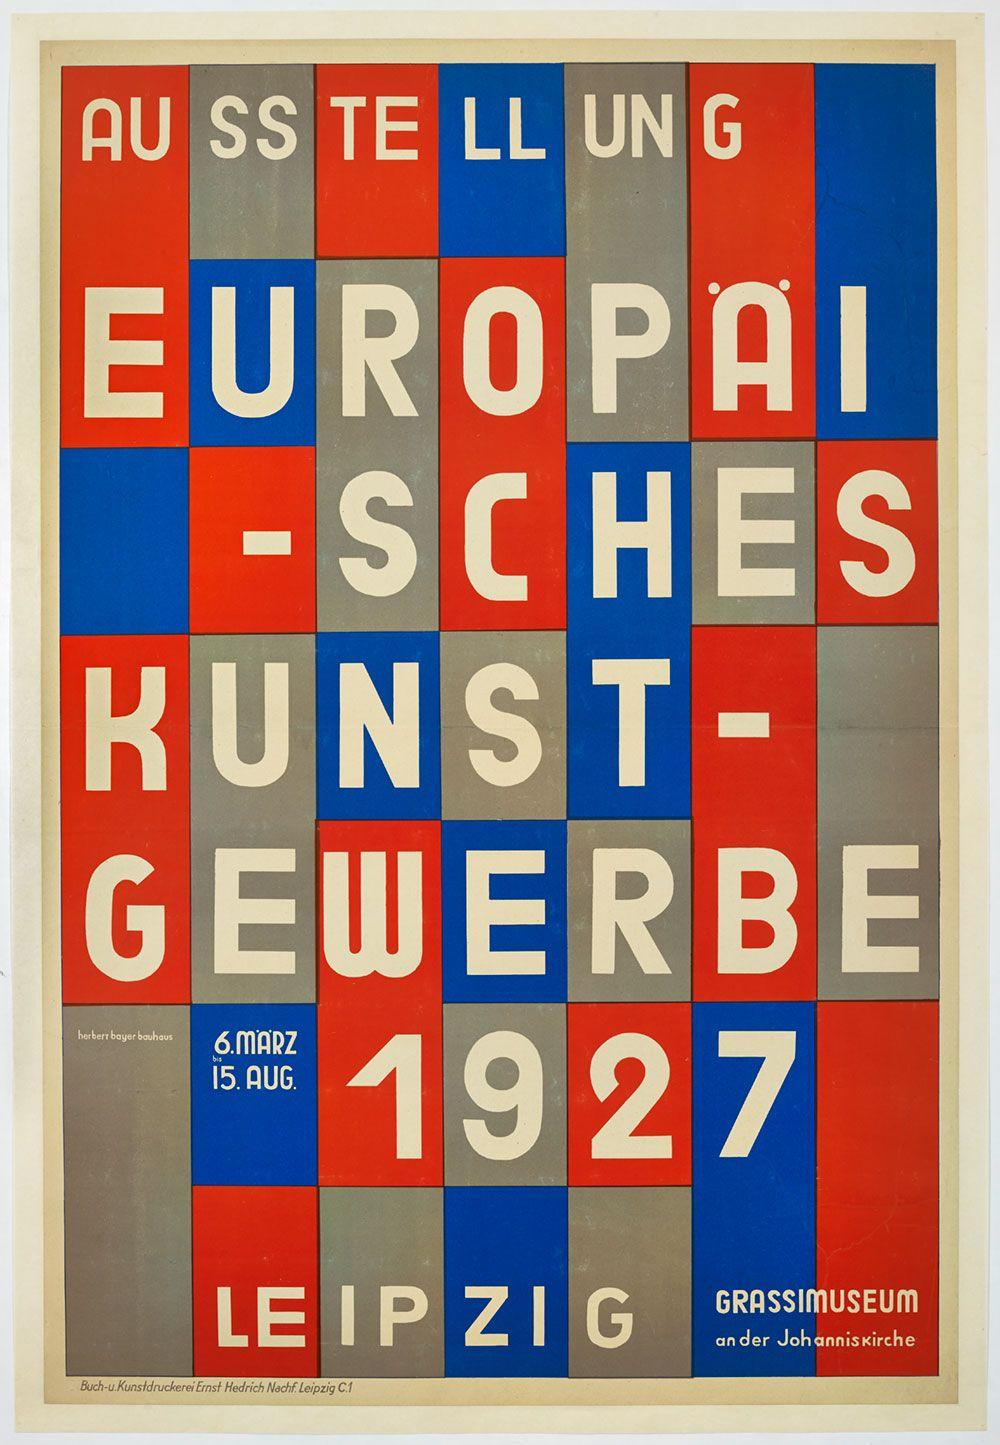 Poster Ausstellung Europaisches Kunstgewerbe 1927 Herbert Bayer In 2020 Poster Creator Poster Design Graphic Design